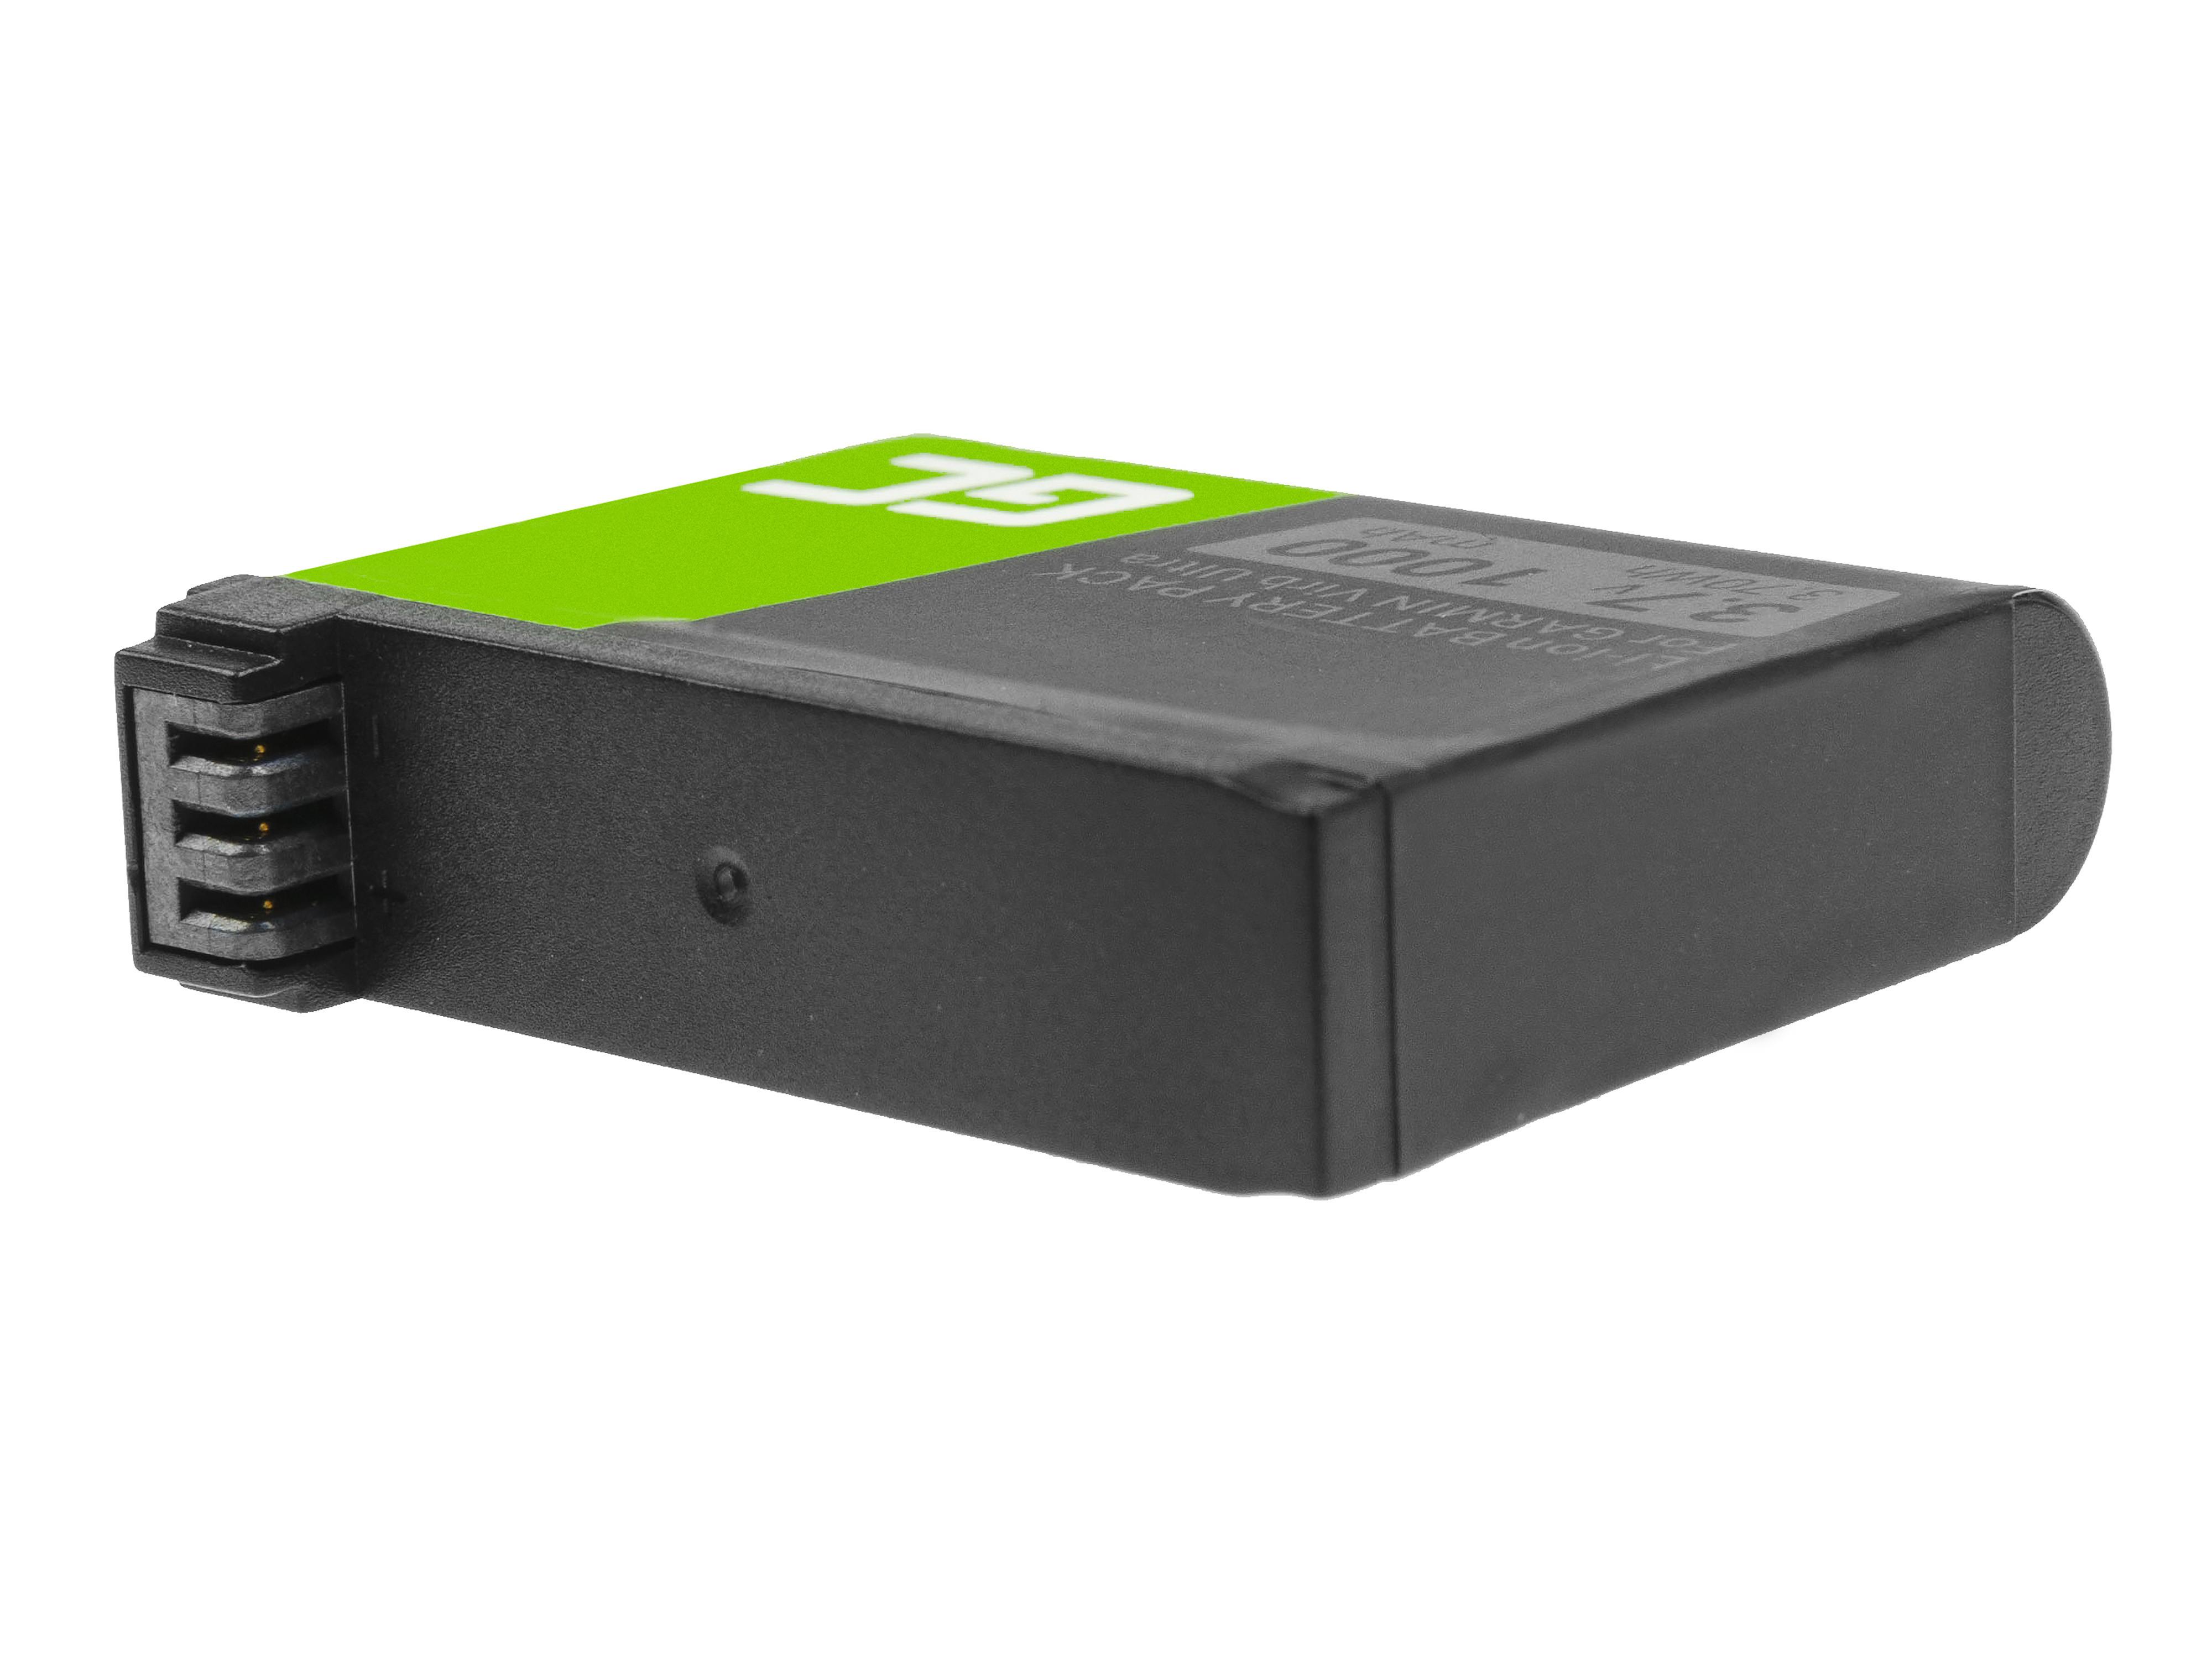 Baterie Green Cell 361-00087-00 010-12389-15, Garmin Virb Ultra 30 3.7V 1000mAh Li-Ion – neoriginální